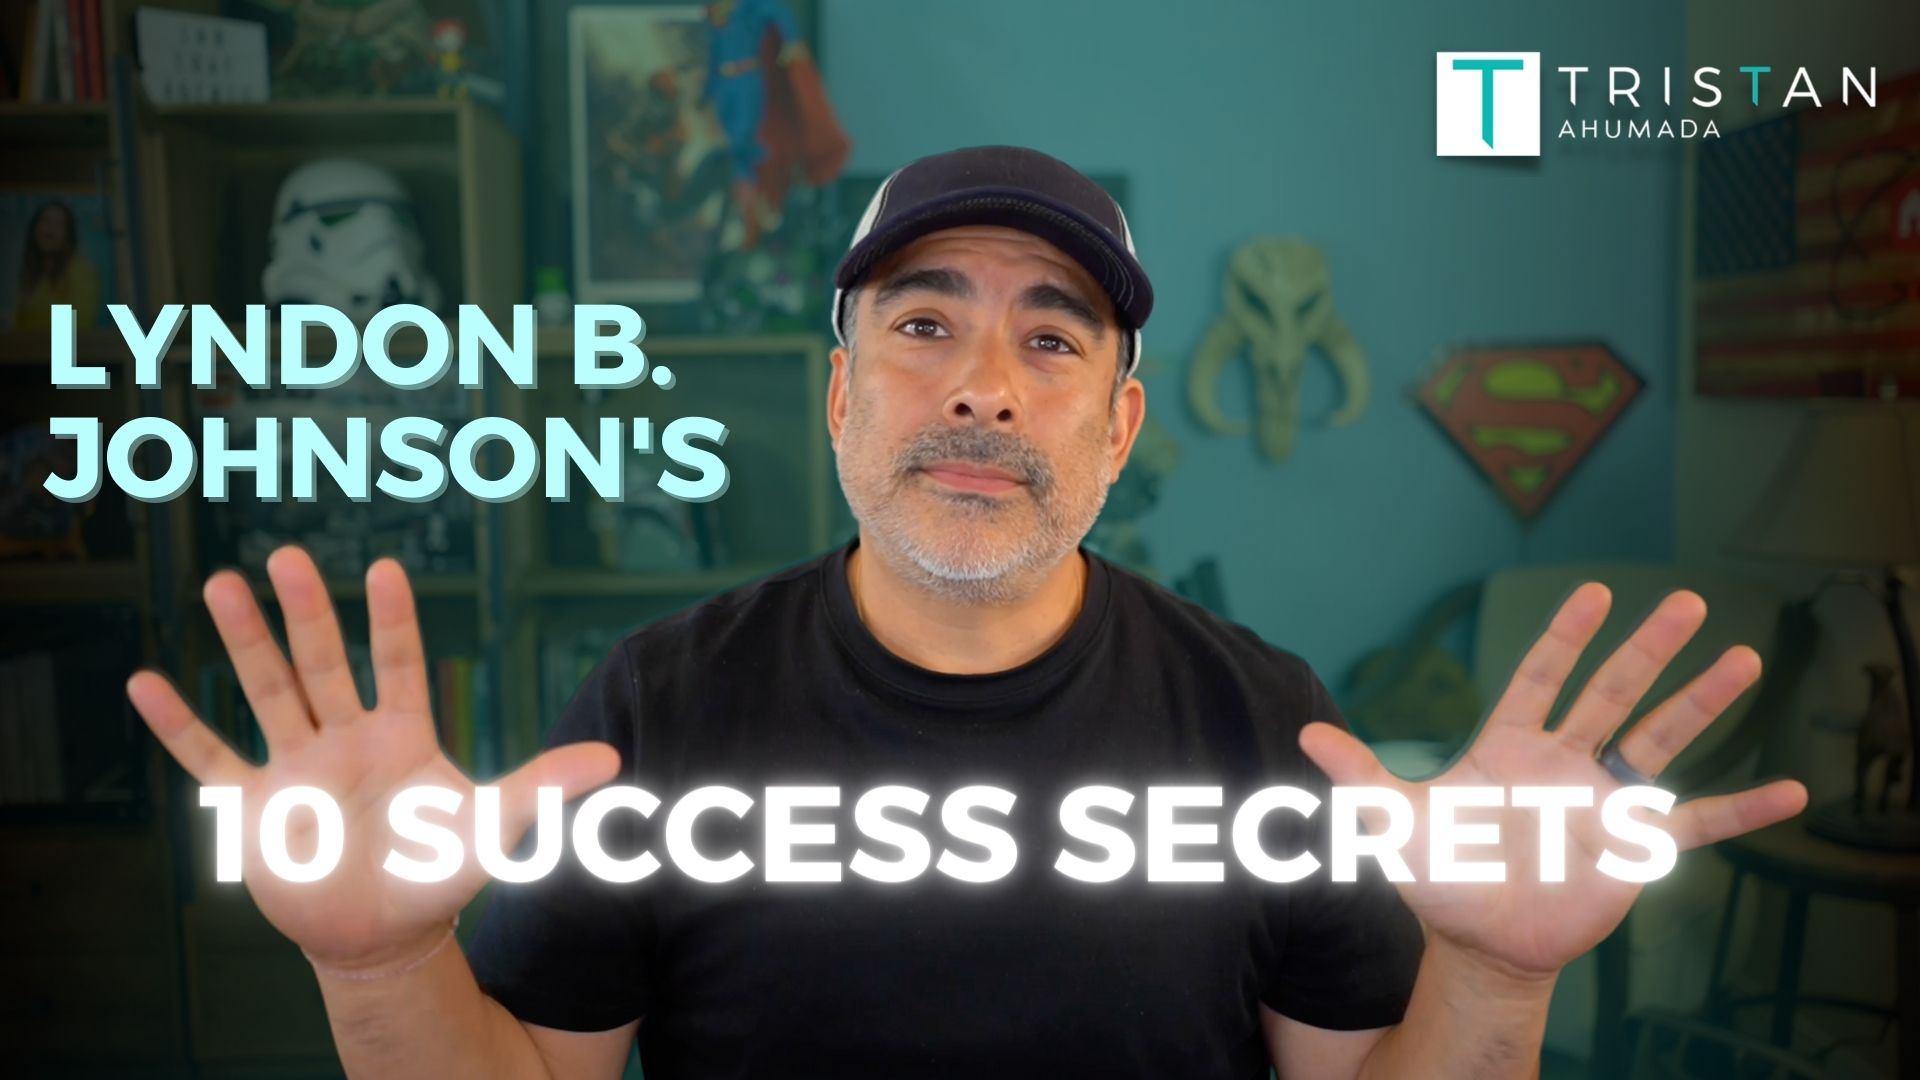 Lyndon B. Johnson's 10 Success Secrets